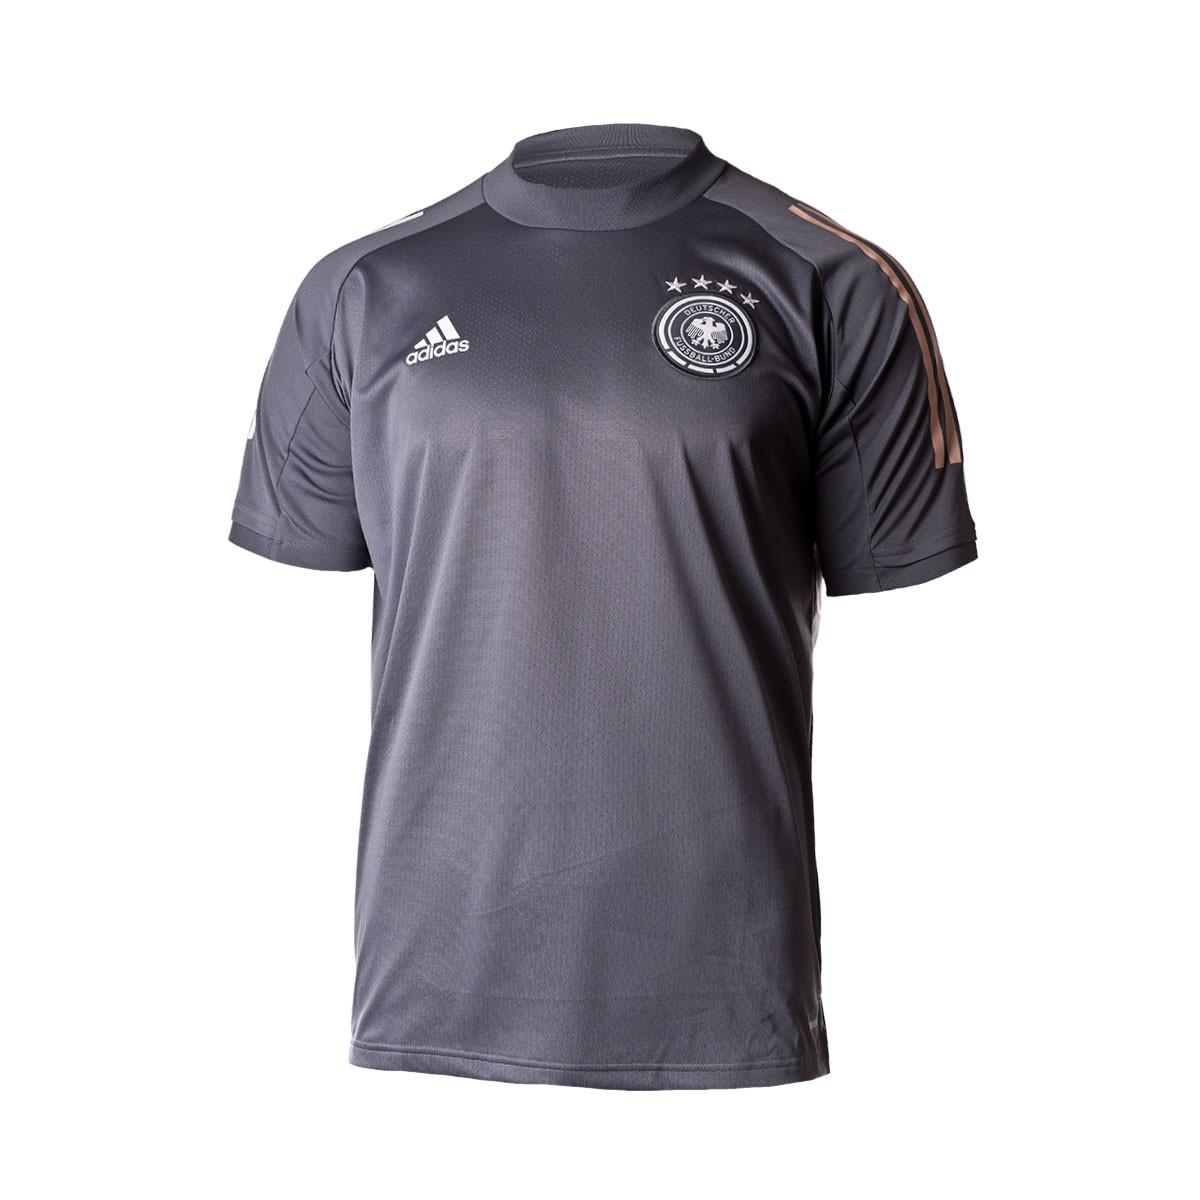 Camiseta adidas Alemania Training 2019 2020